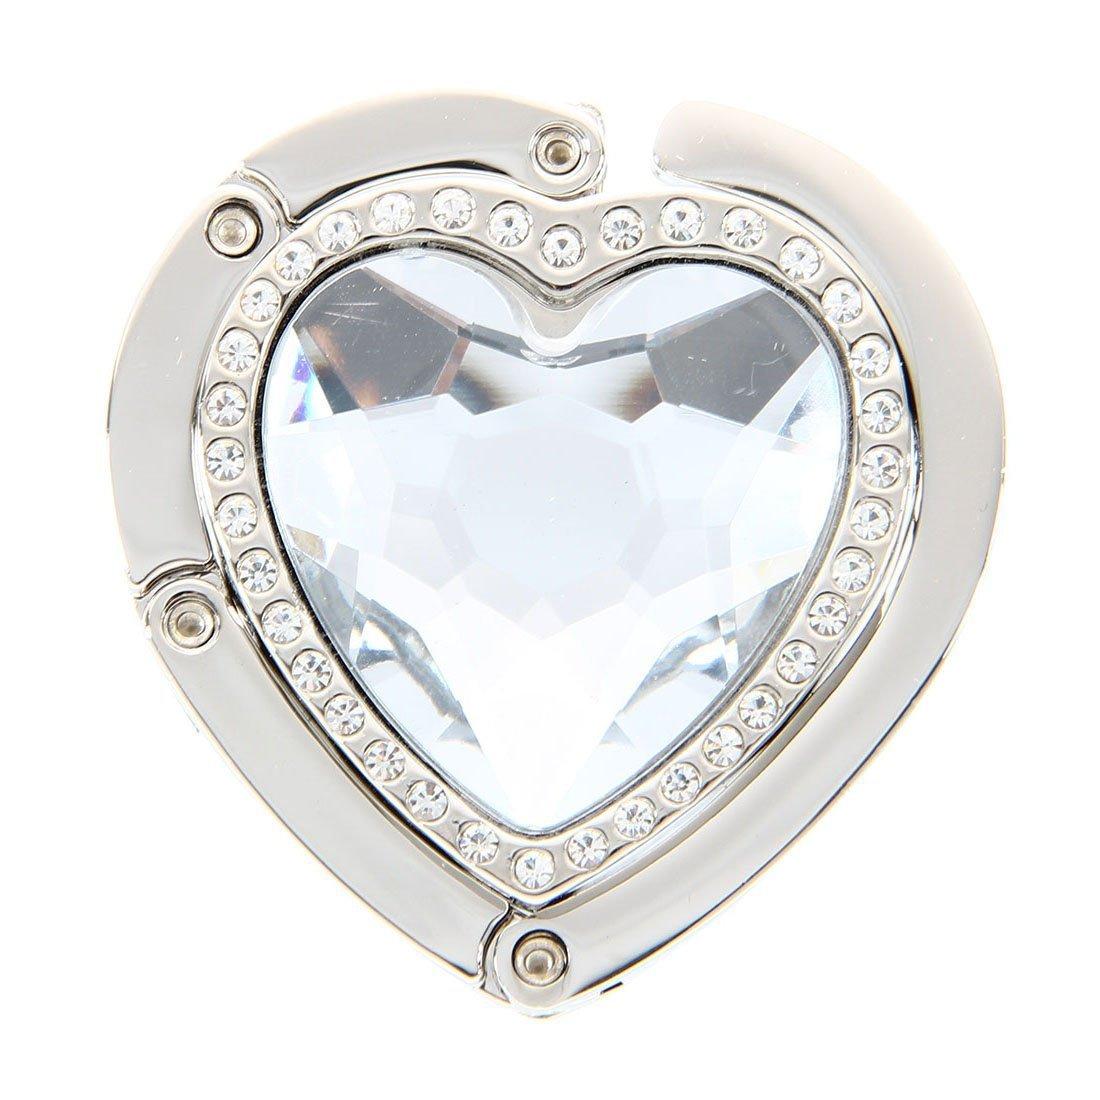 SODIAL(R) Forme de coeur pliable crochet pour porte-monnaie Sac a main sac LEPAZN3417